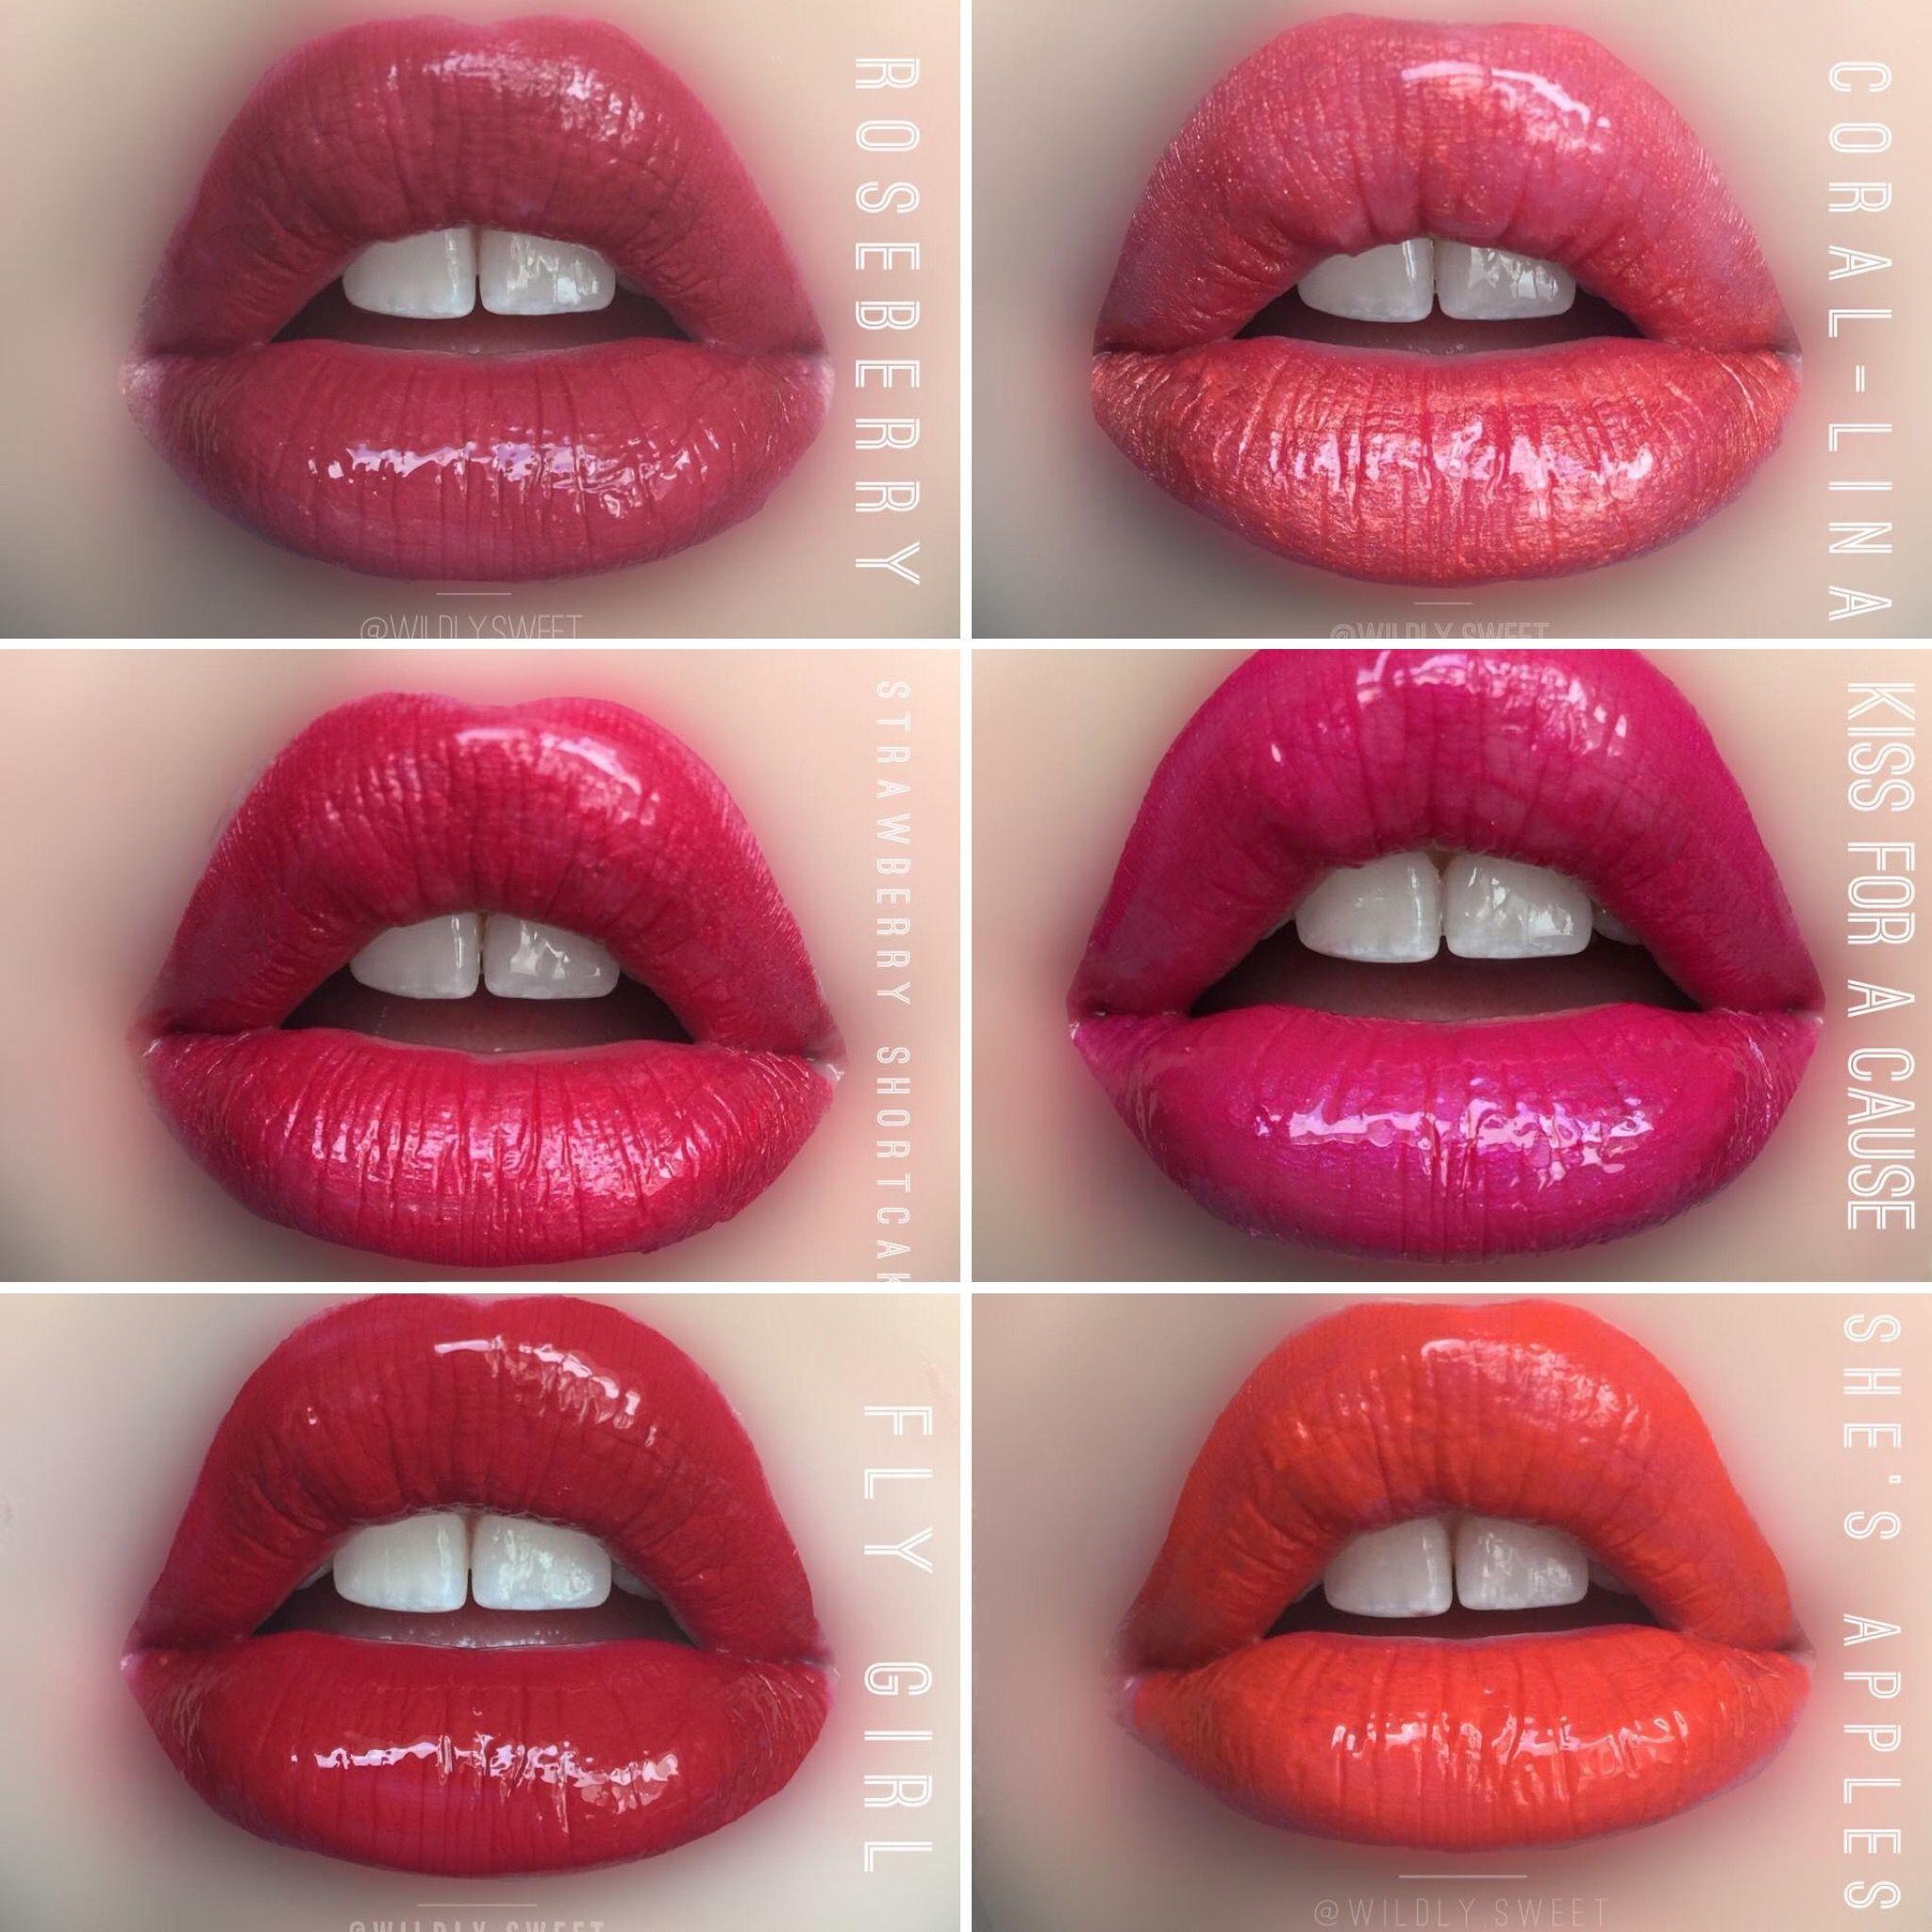 Lipsense The Lipstick That Doesn T Come Off Magic Makeup Www